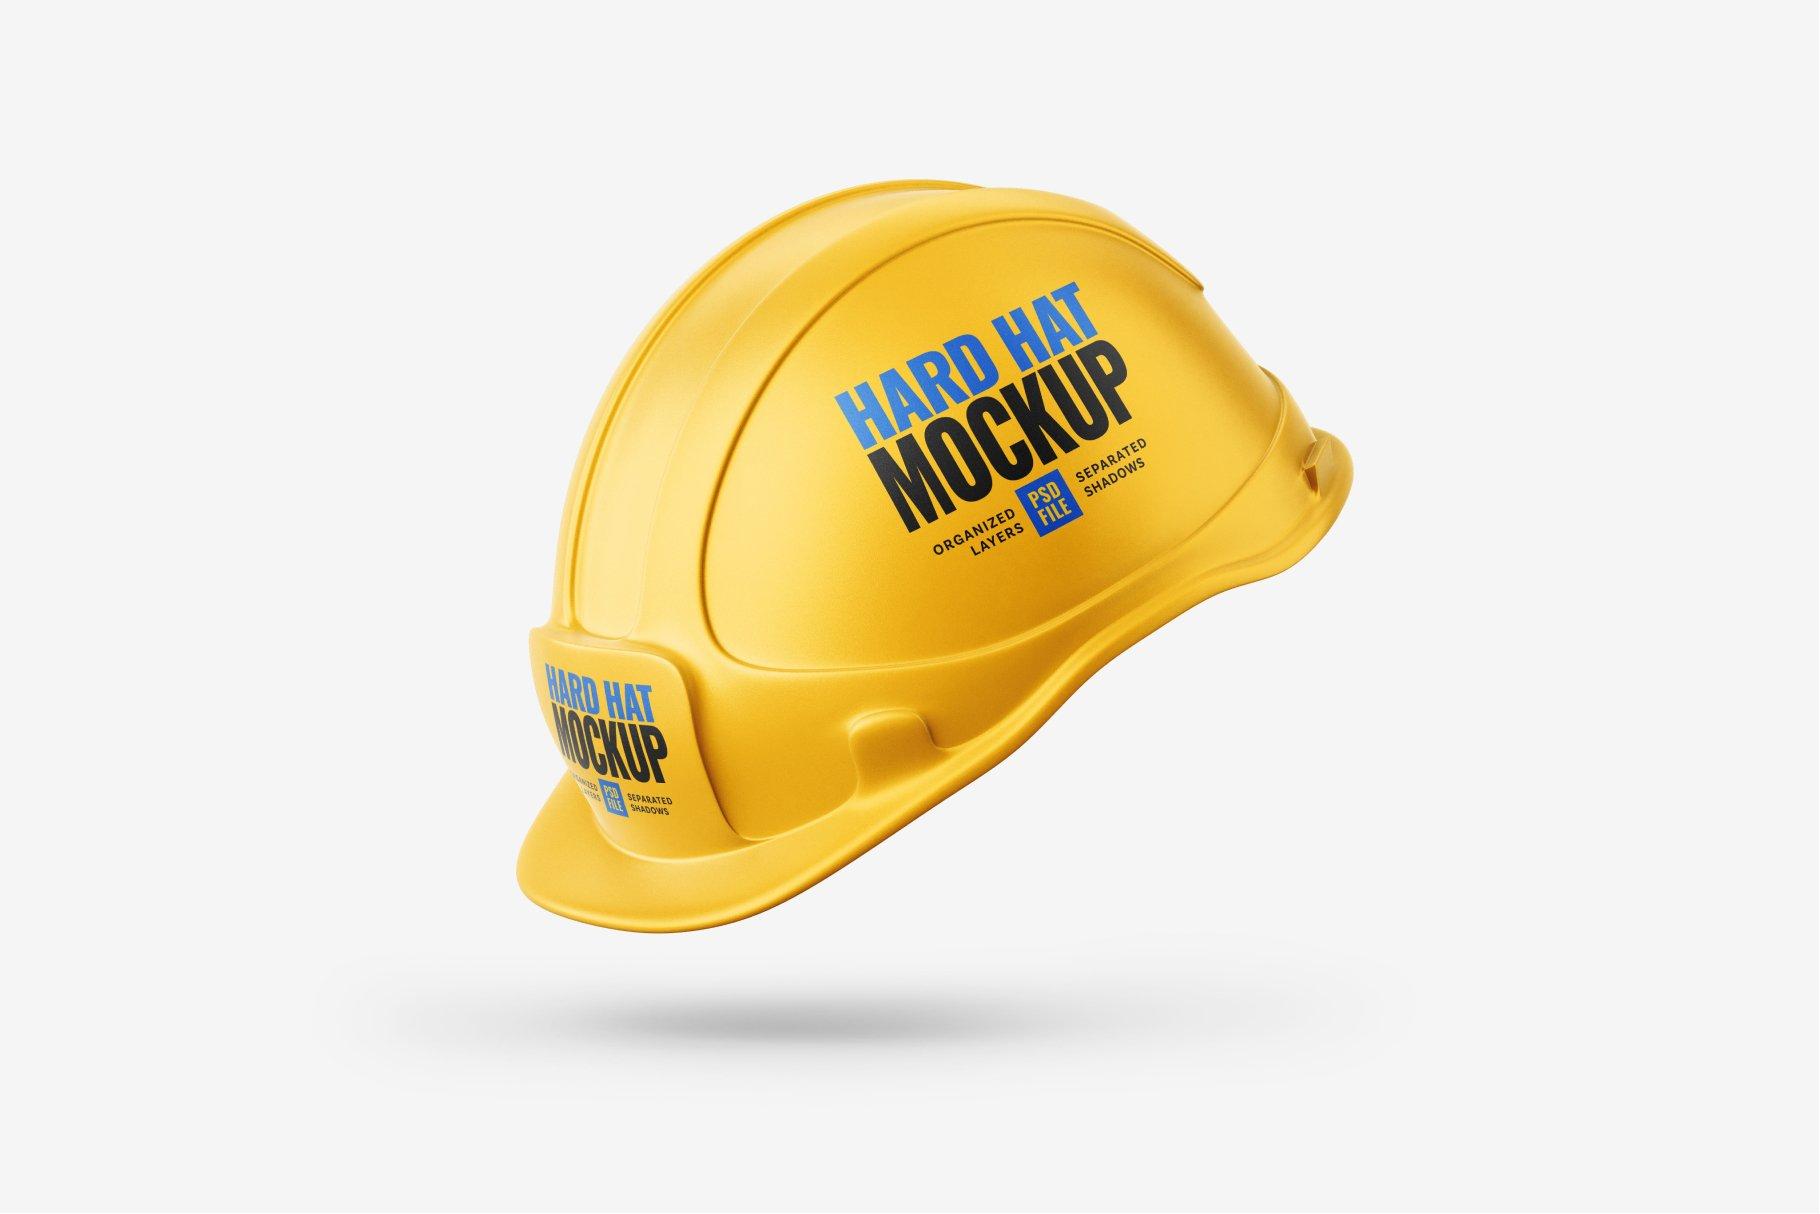 8款逼真工程安全帽头盔设计样机PSD模板素材 Construction Hard Hat Mockup Set插图8